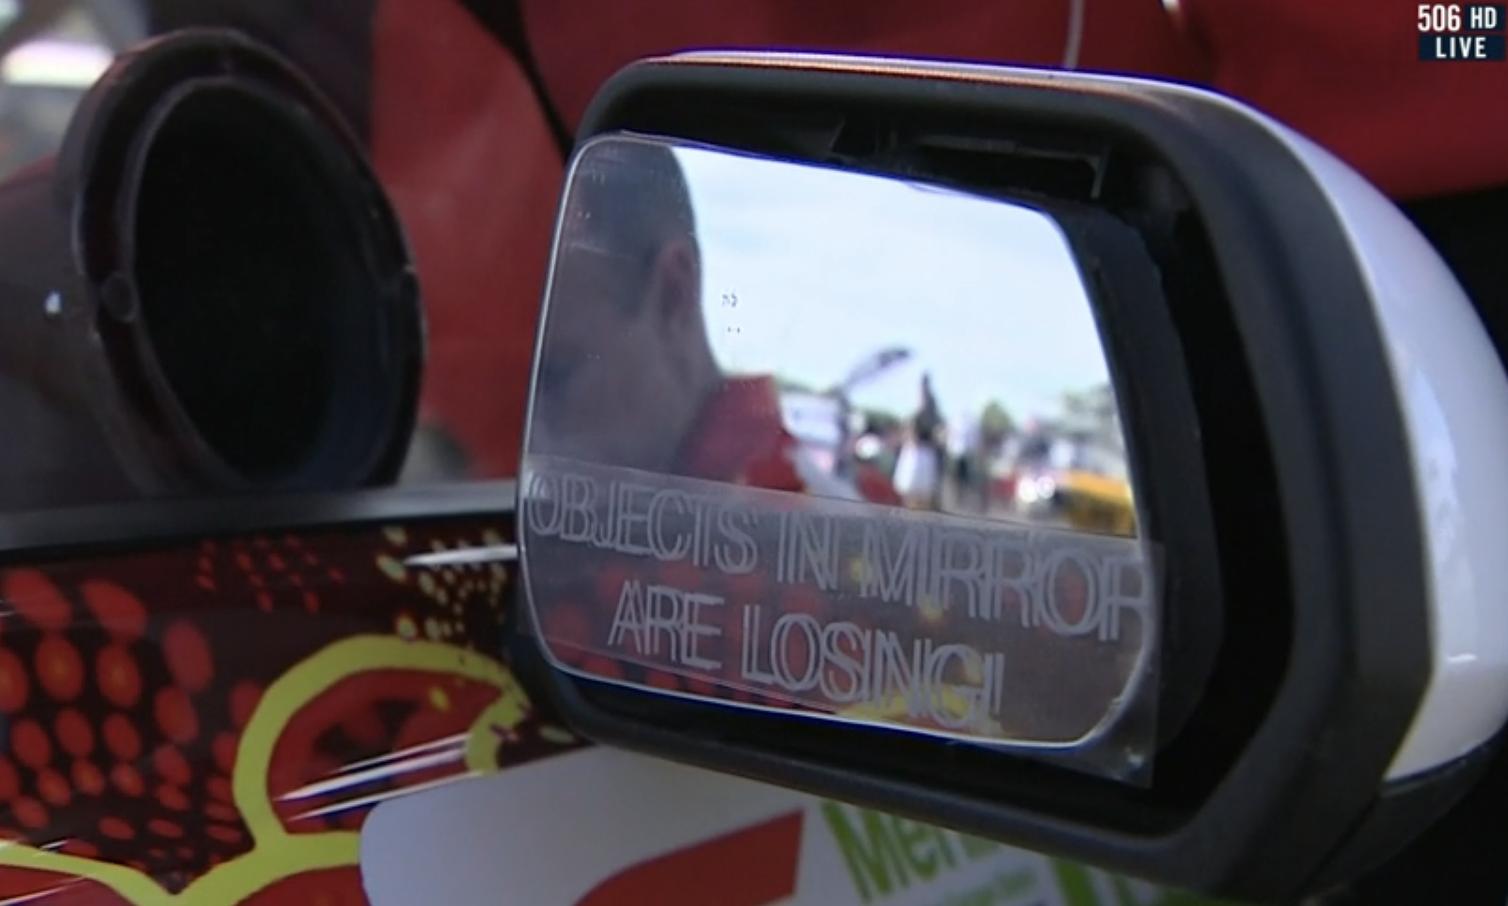 DJR Mirror sticker